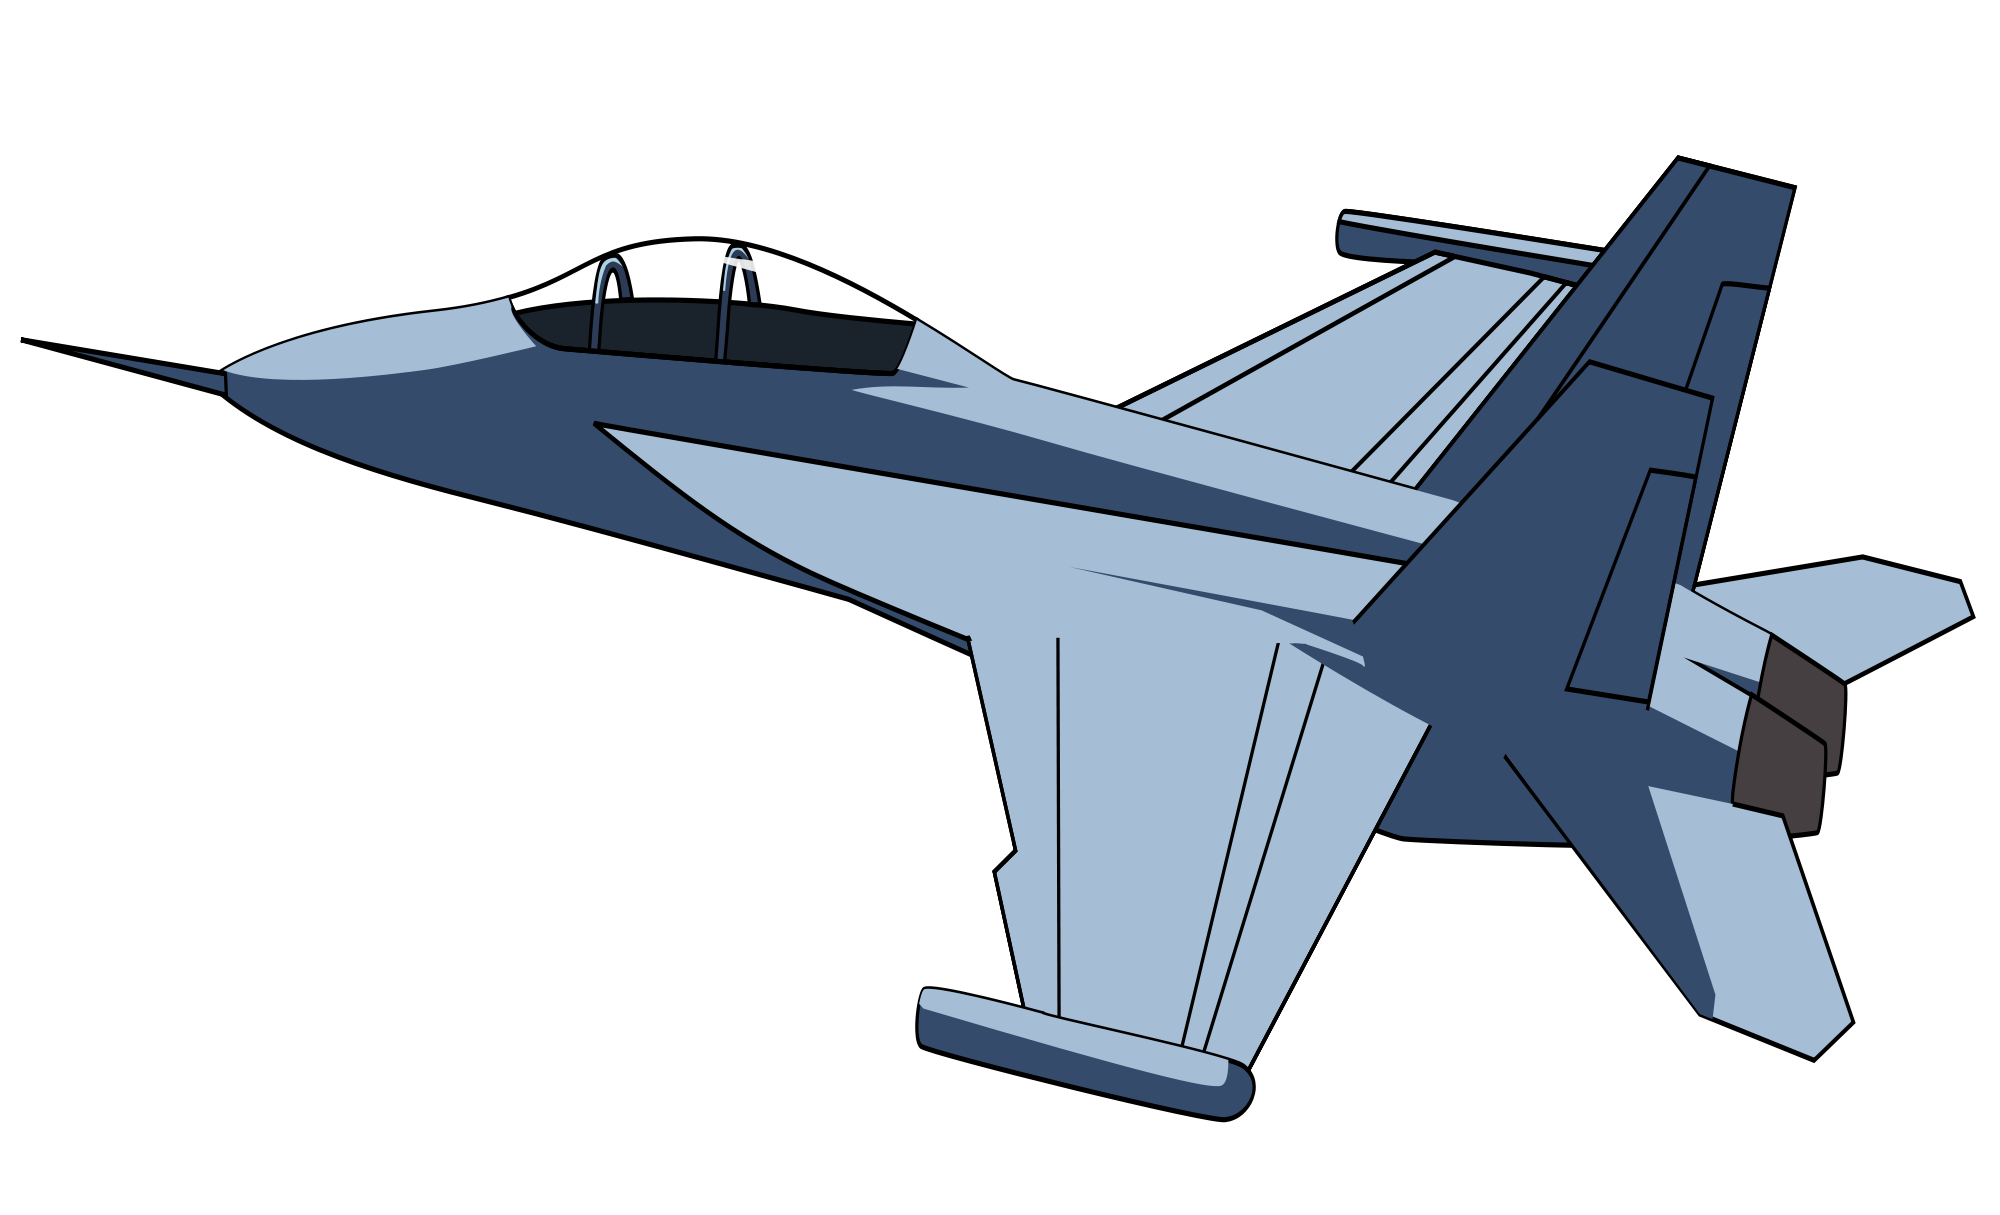 File:Model aviona.svg.